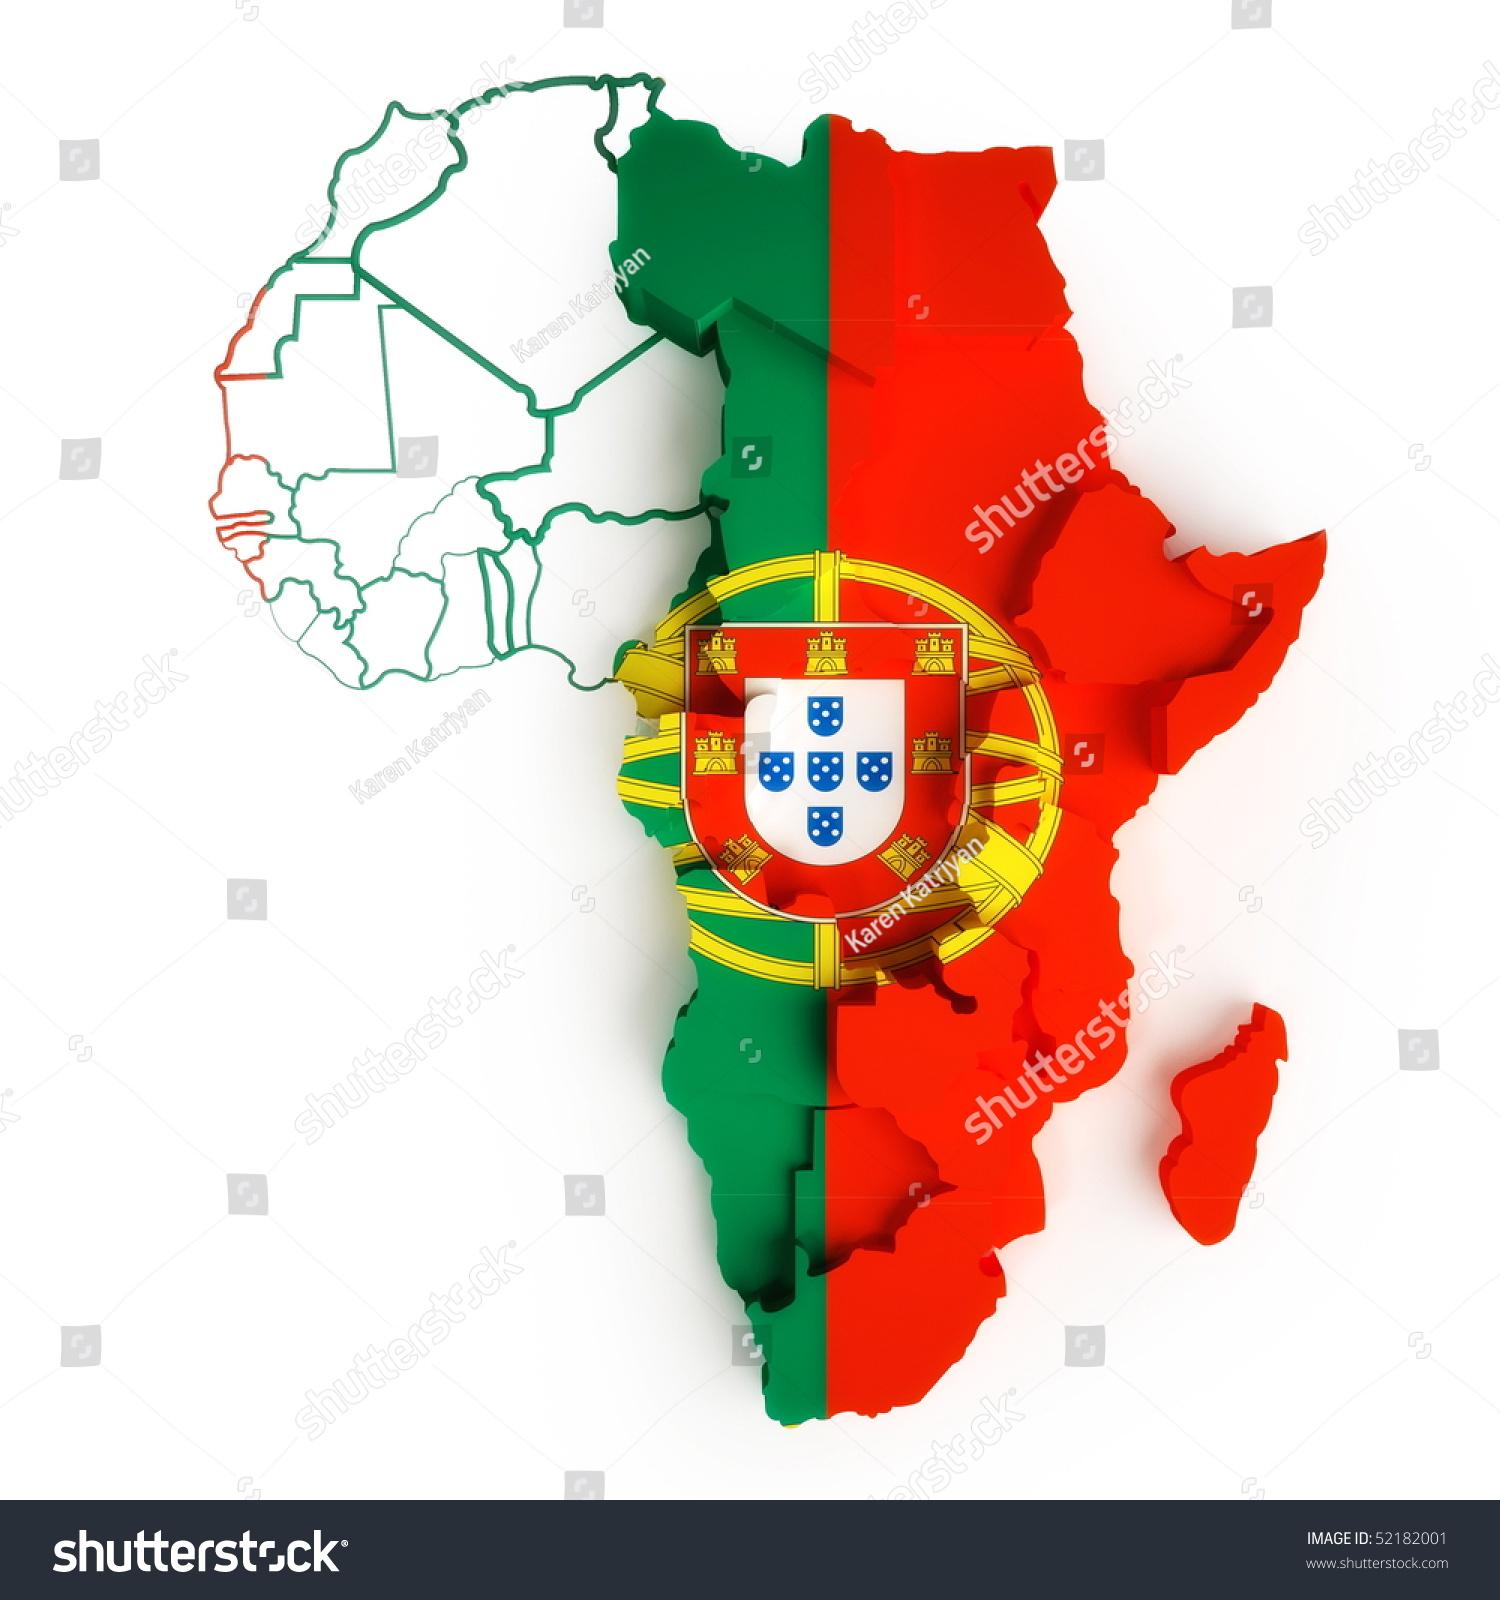 Portugal Flag On Map Africa National Stock Illustration - Portugal map flag